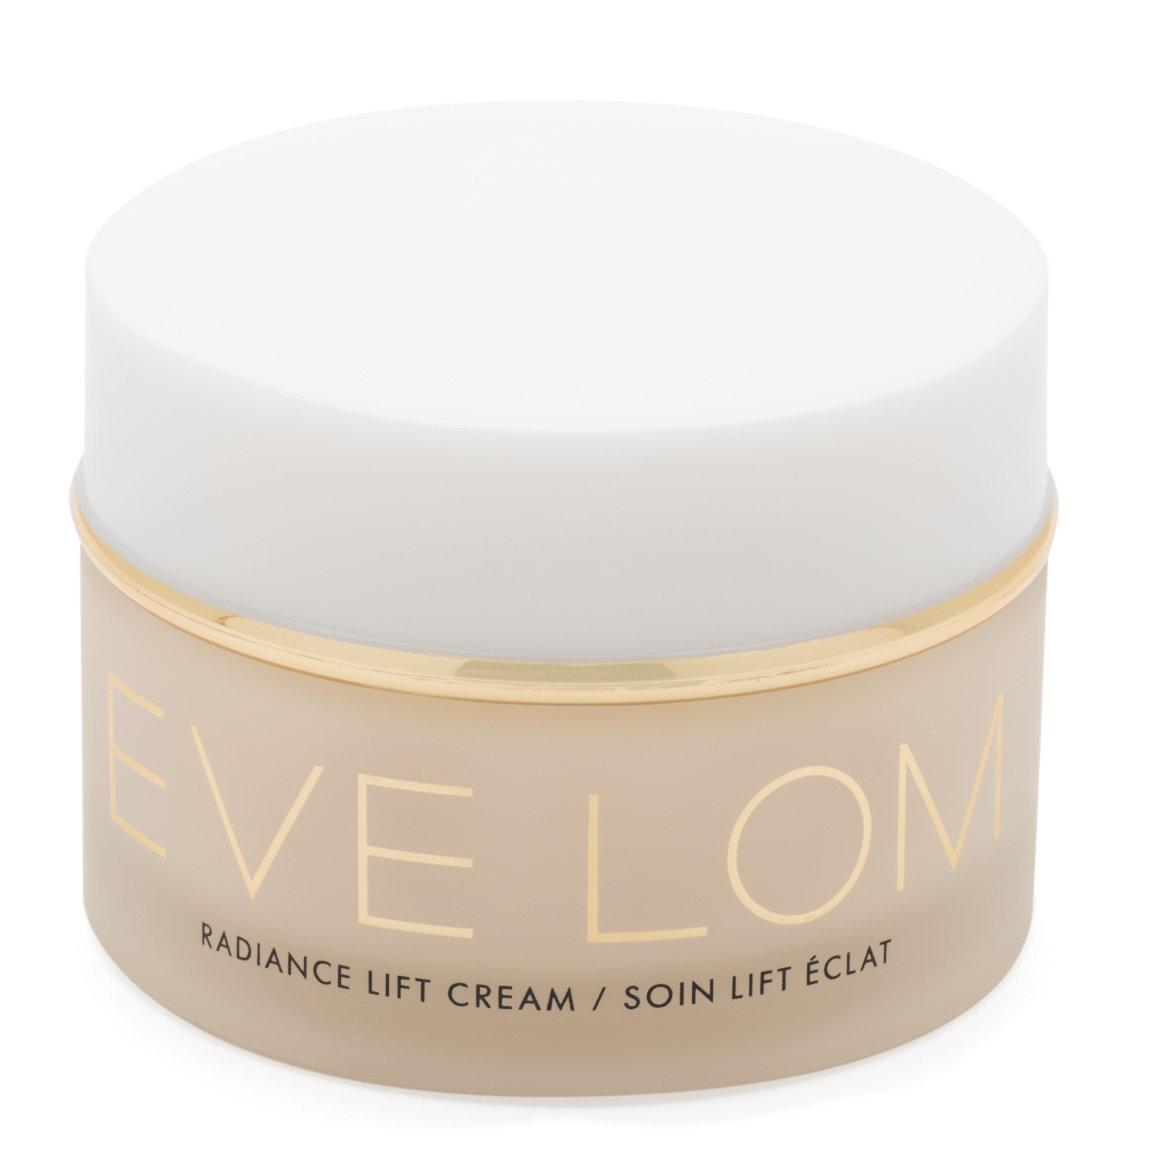 EVE LOM Radiance Lift Cream 50 ml alternative view 1 - product swatch.